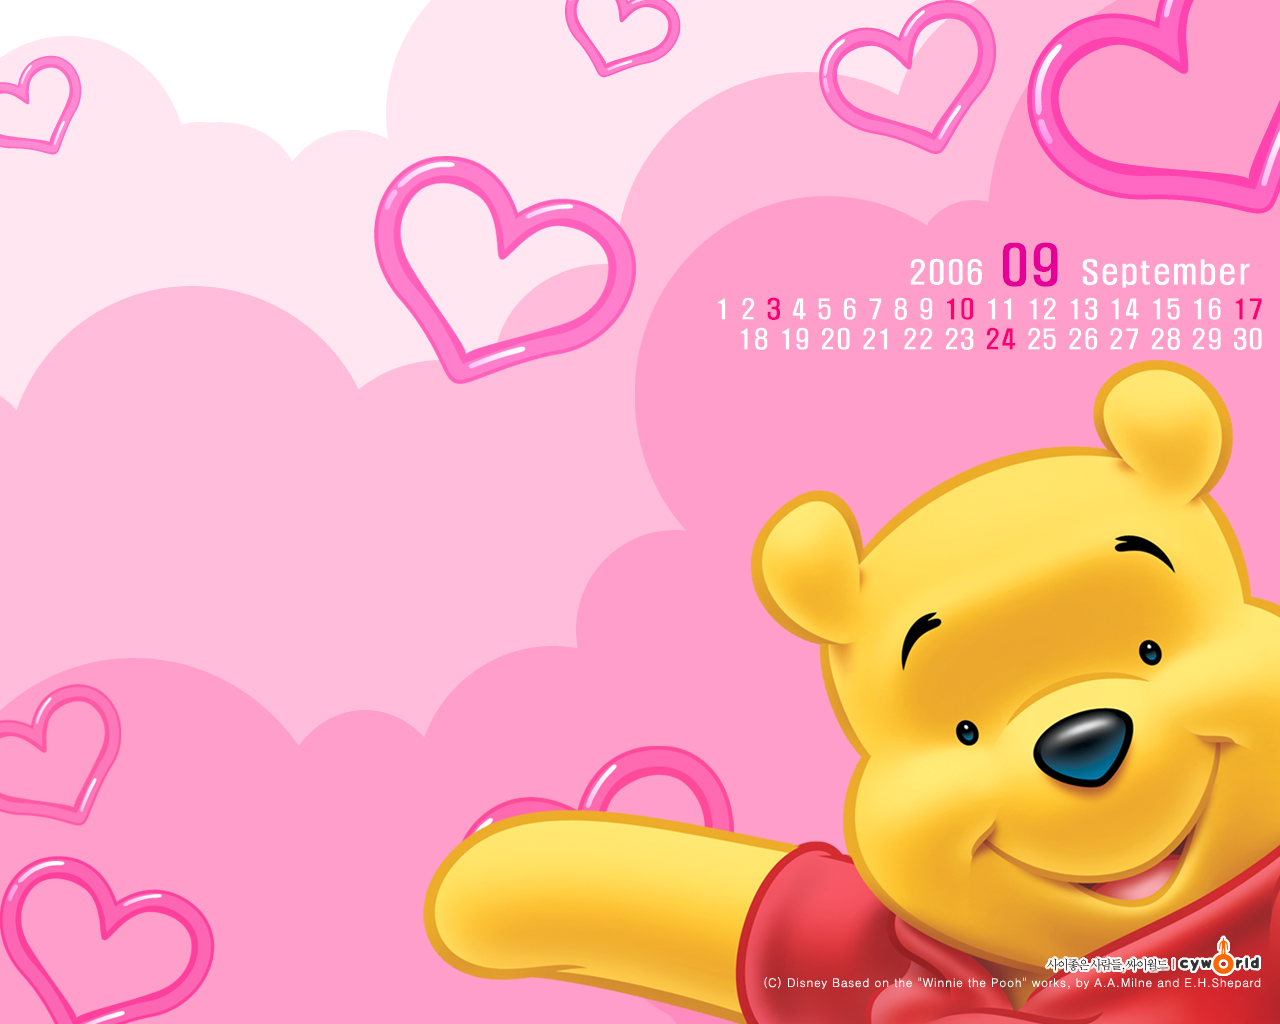 http://2.bp.blogspot.com/-e5XJQz17Gao/TscLkK_wlcI/AAAAAAAAAmw/j0buML8rcCg/s1600/winnie-the-pooh-hd-8-772300.jpg